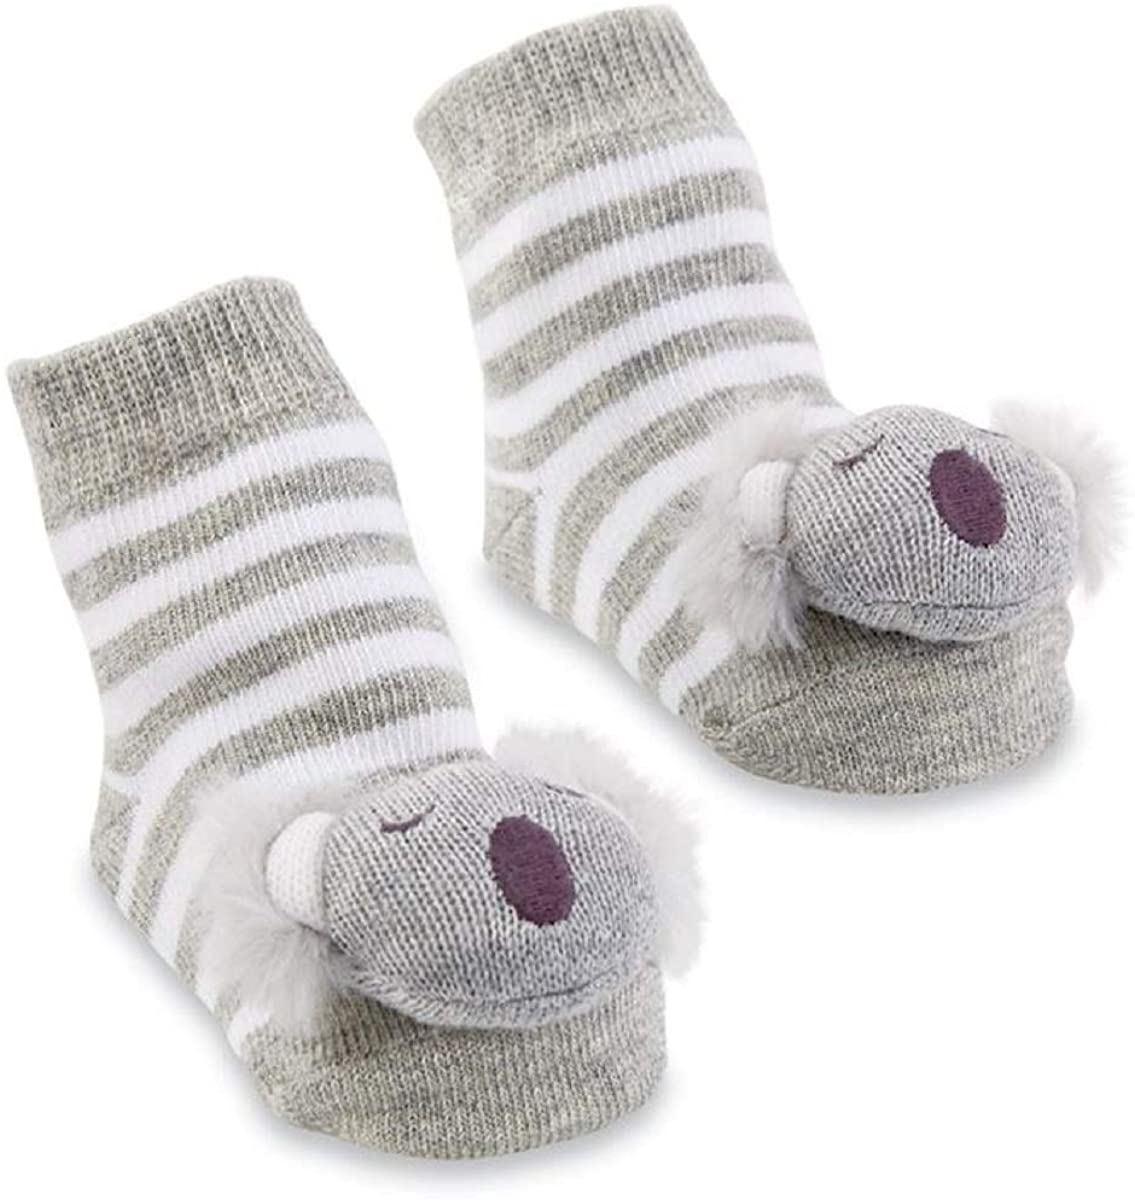 Mud Pie Koala Rattle Toe Socks, Grey, White, 0-12M